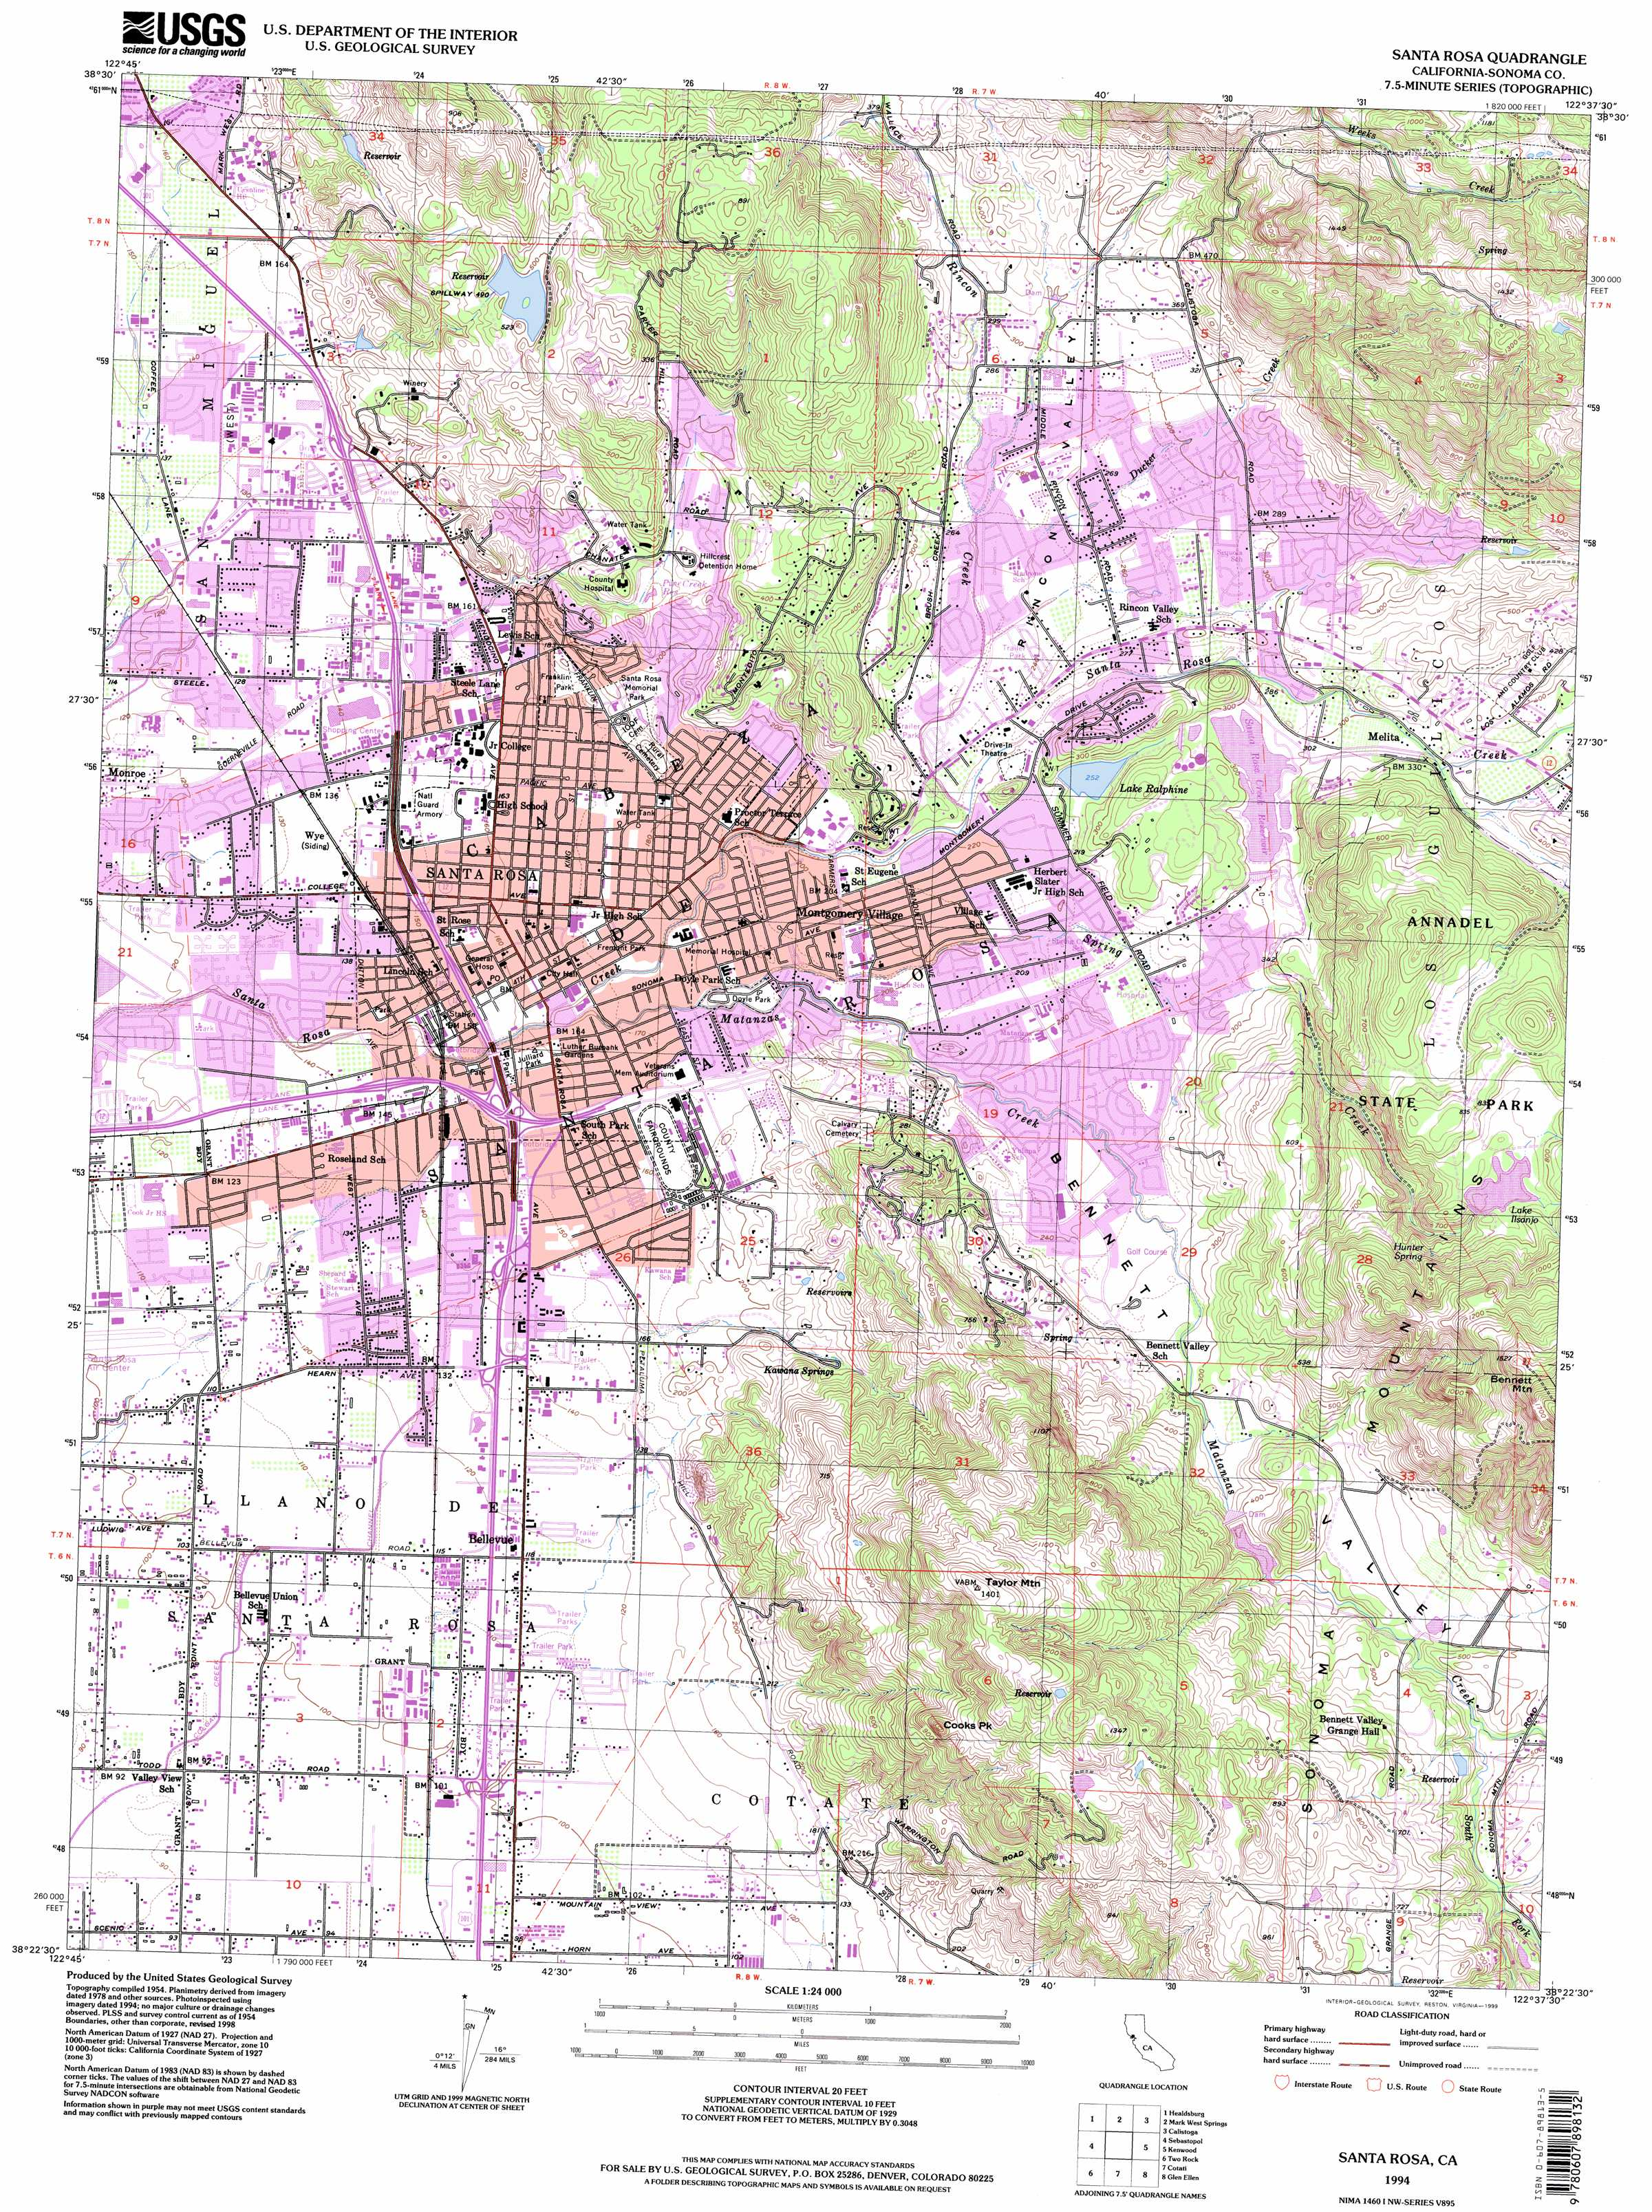 Santa Rosa topographic map CA USGS Topo Quad 38122d6